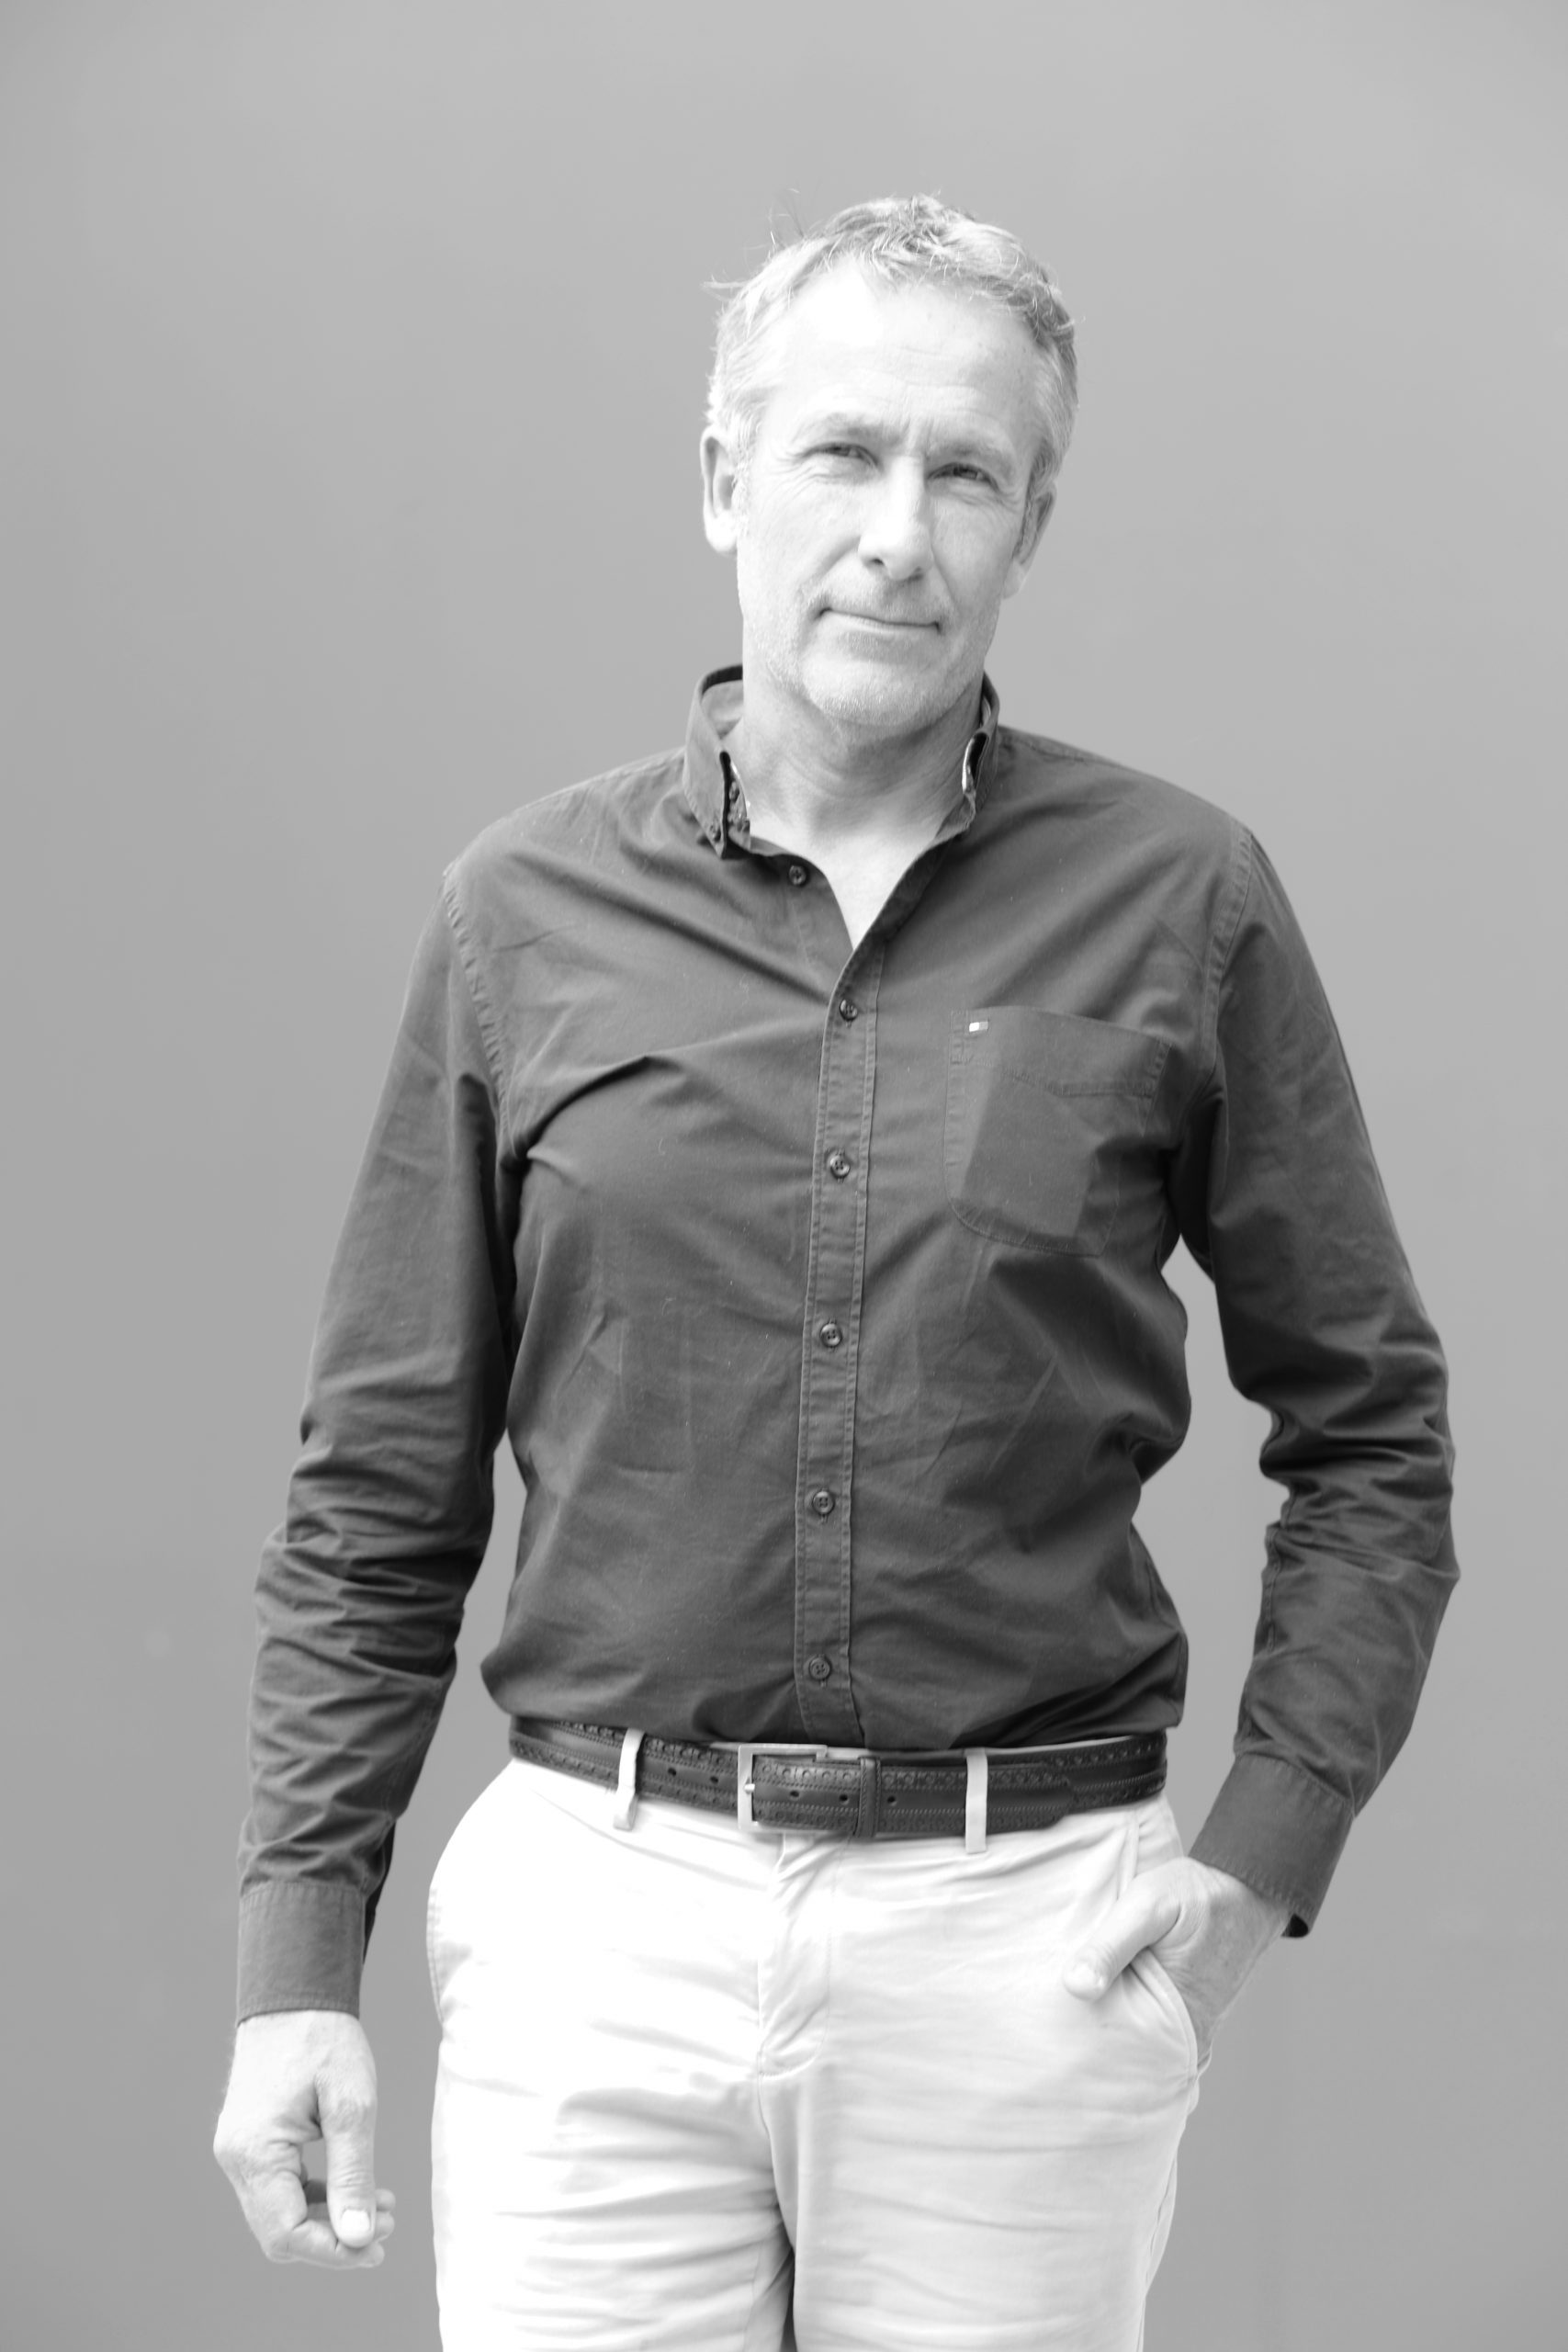 Pierre Galache